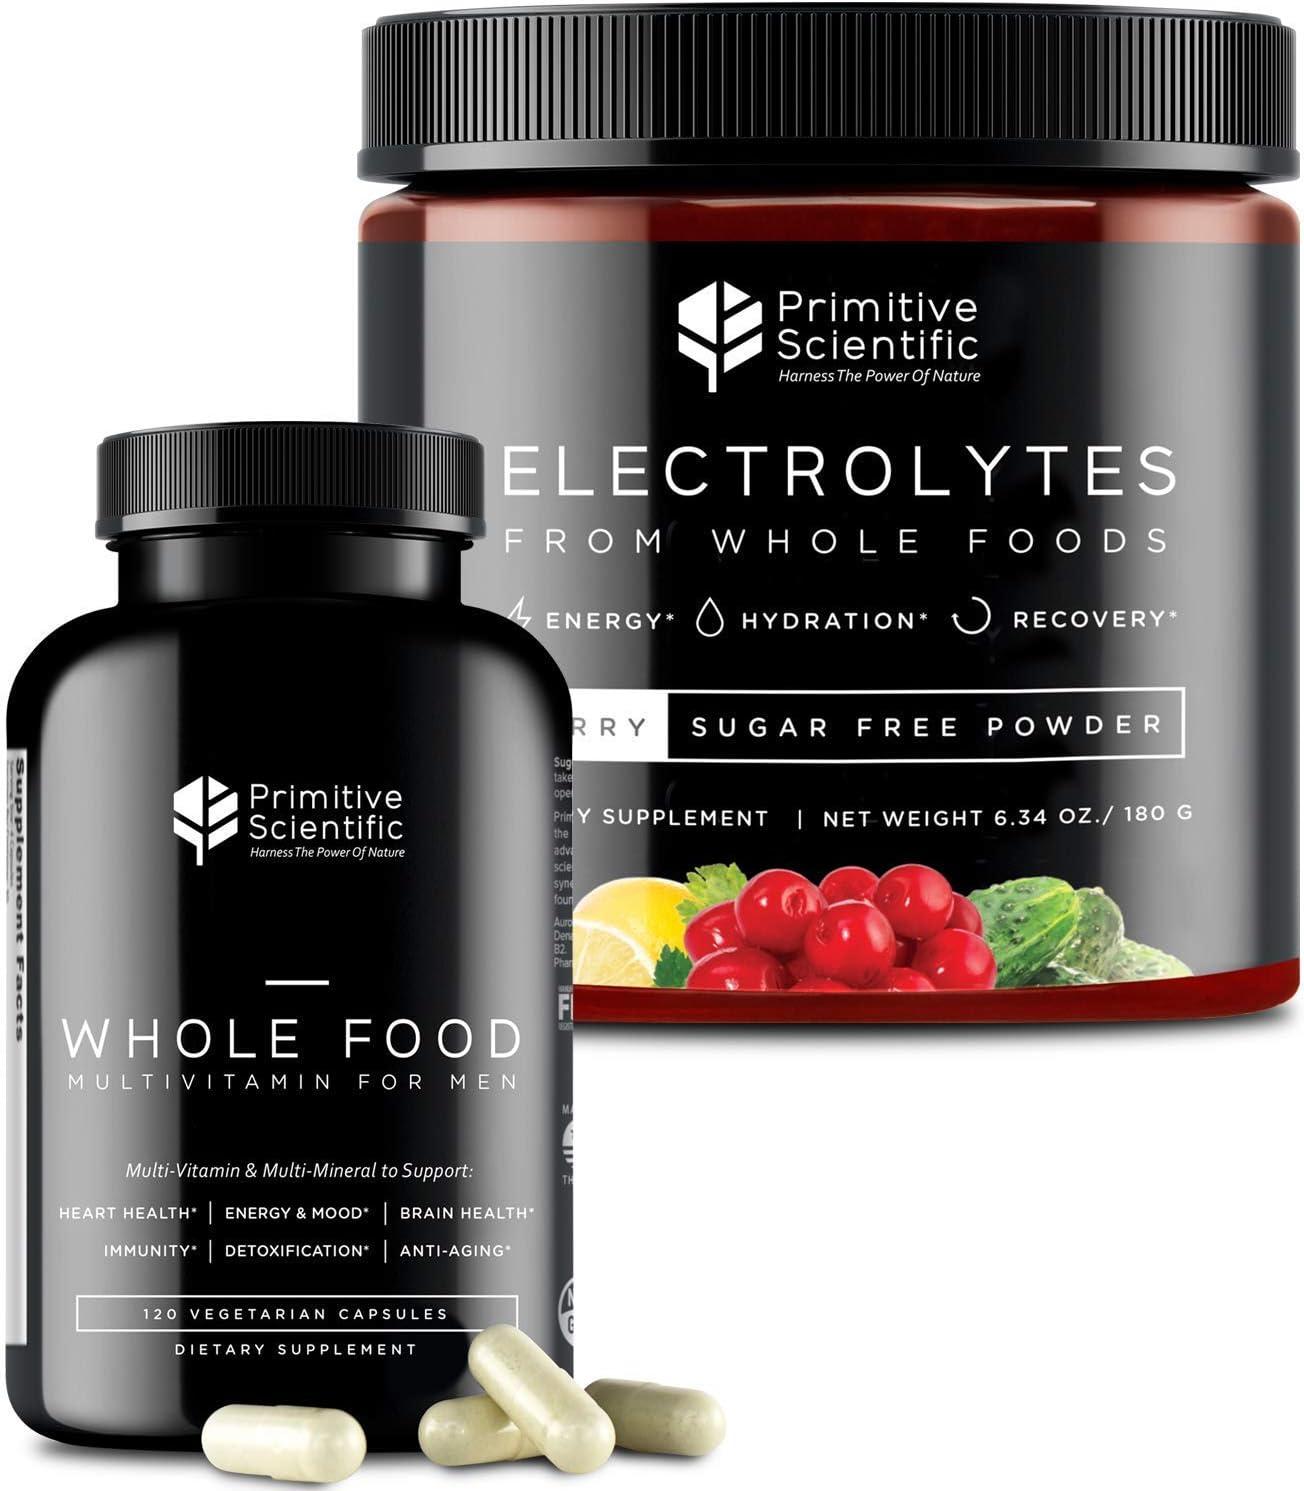 Primitive Scientific Whole Food Supplement for Men's Holistic Health (Bundle) | Men's Multivitamins (120 Vegetarian Capsules) + Sugar-Free Electrolyte Powder (180g) | 100% Natural, Non-GMO